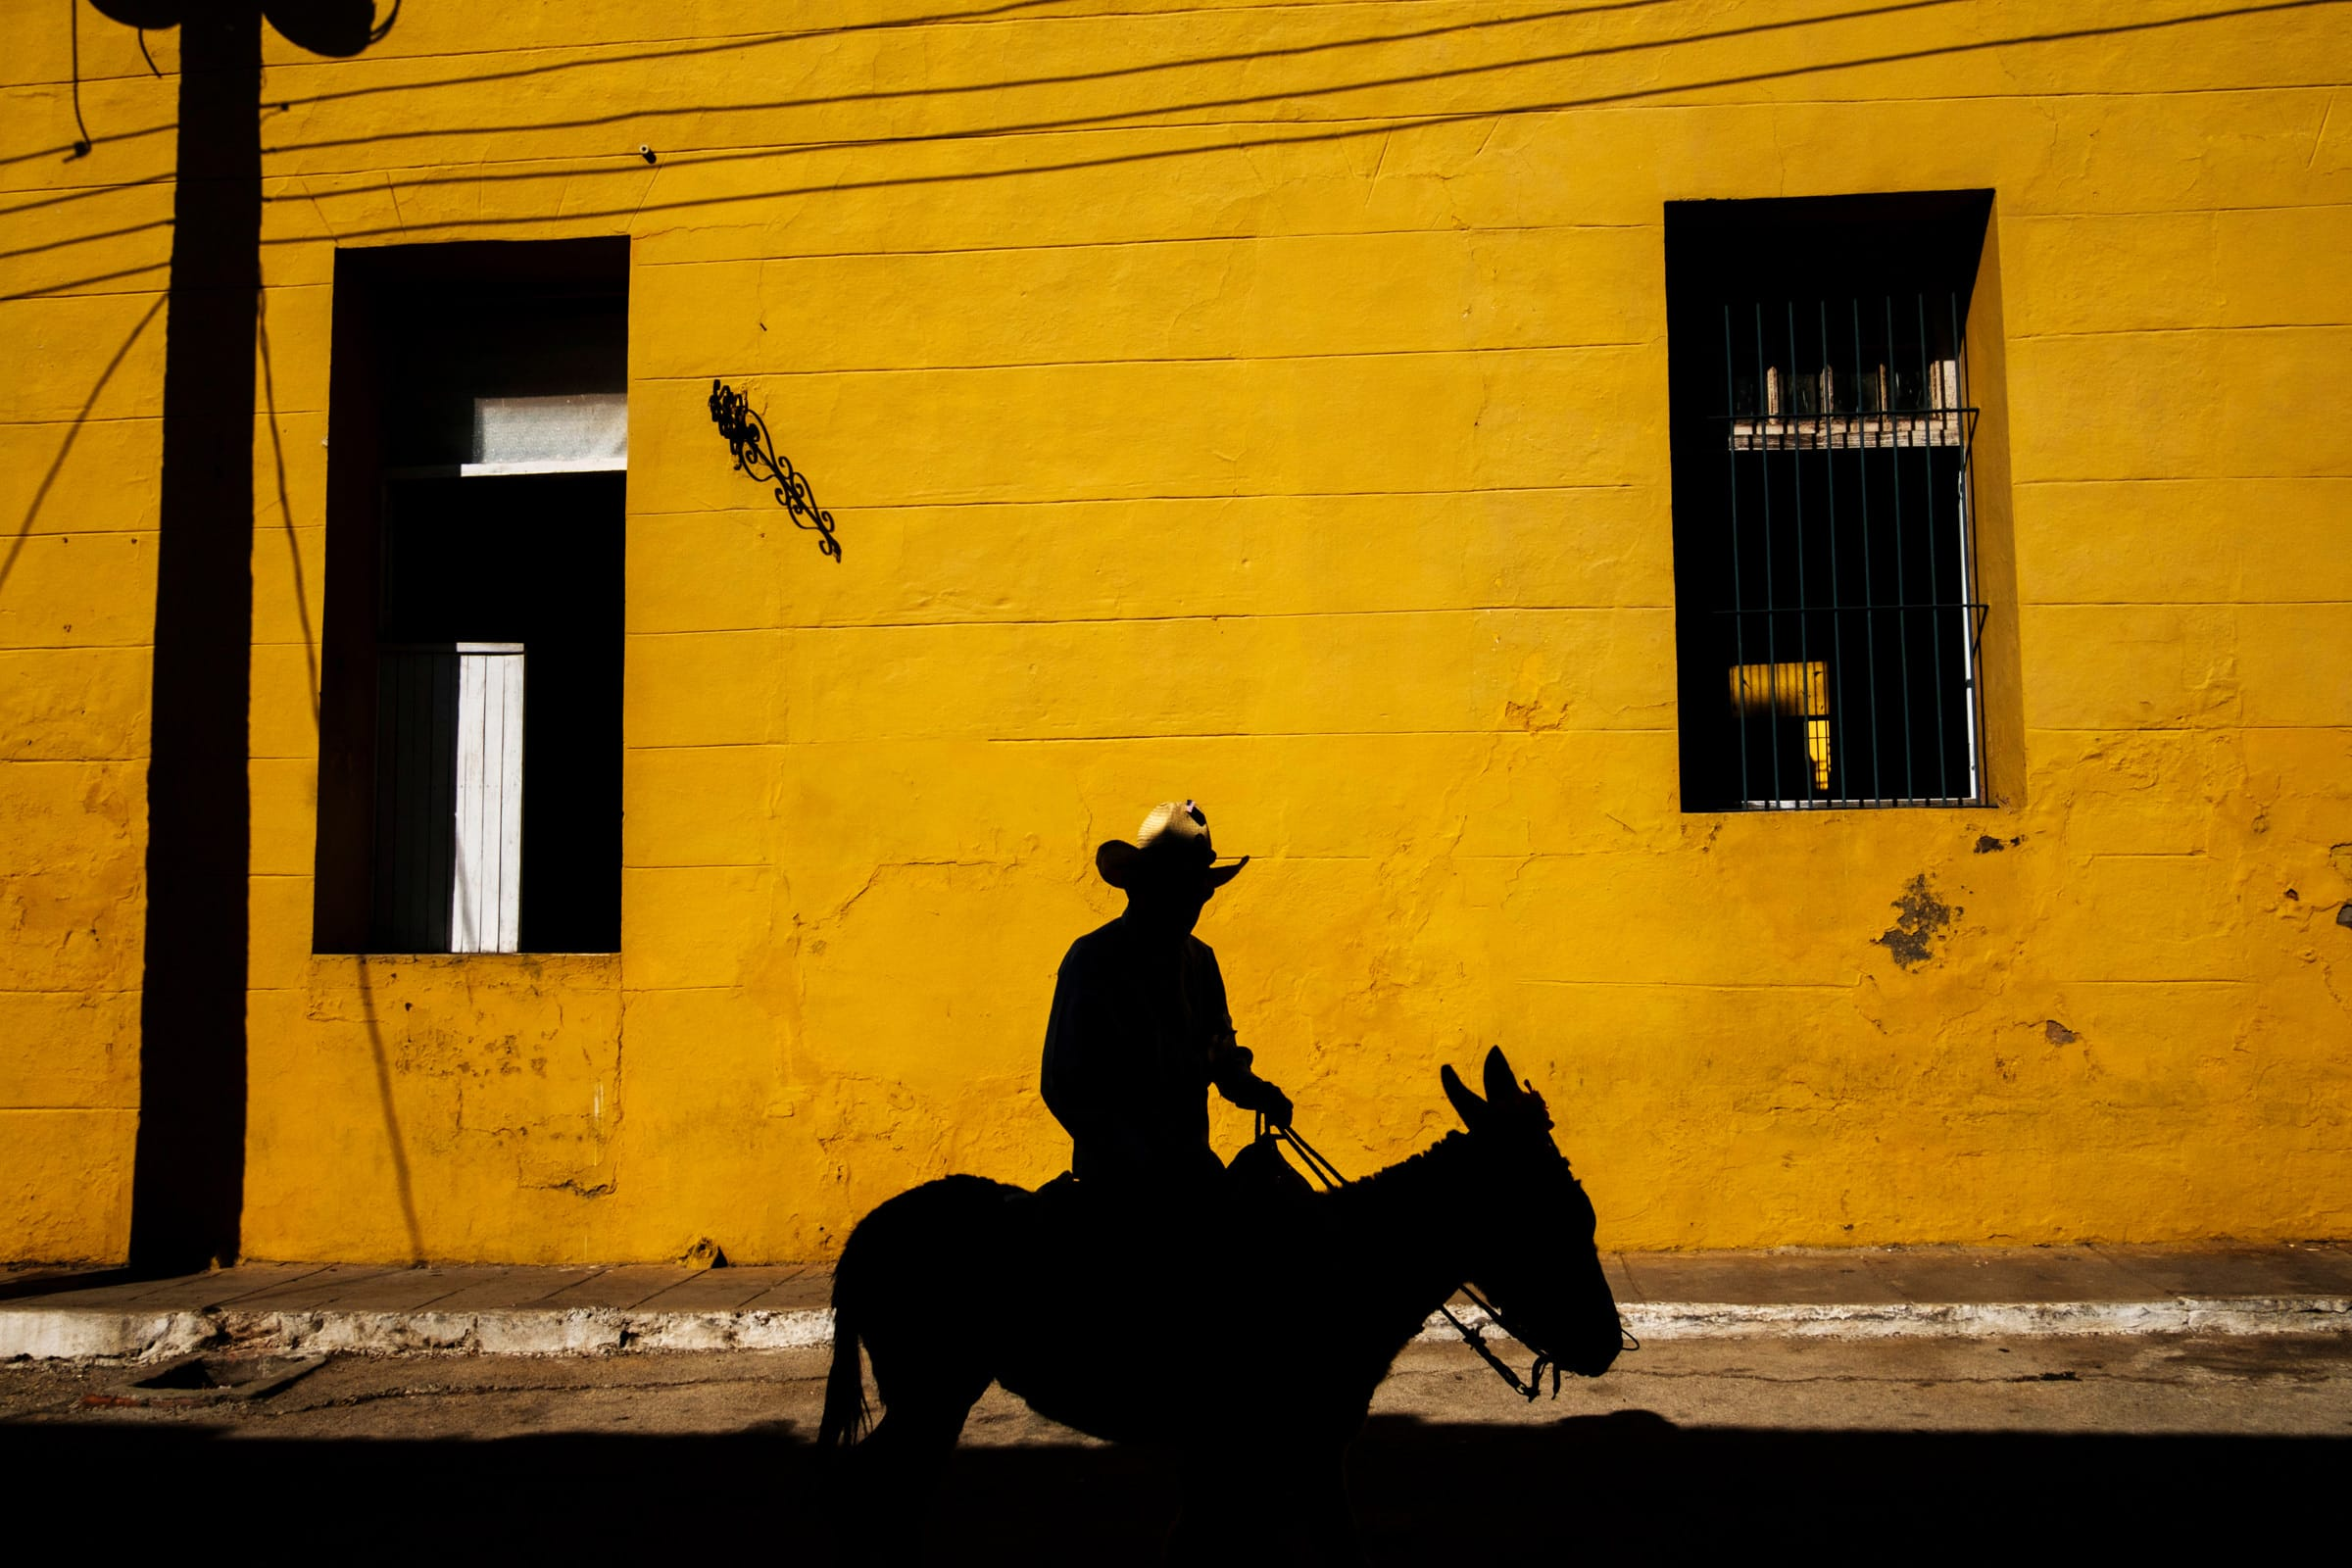 Cuba-Street-Photography-1